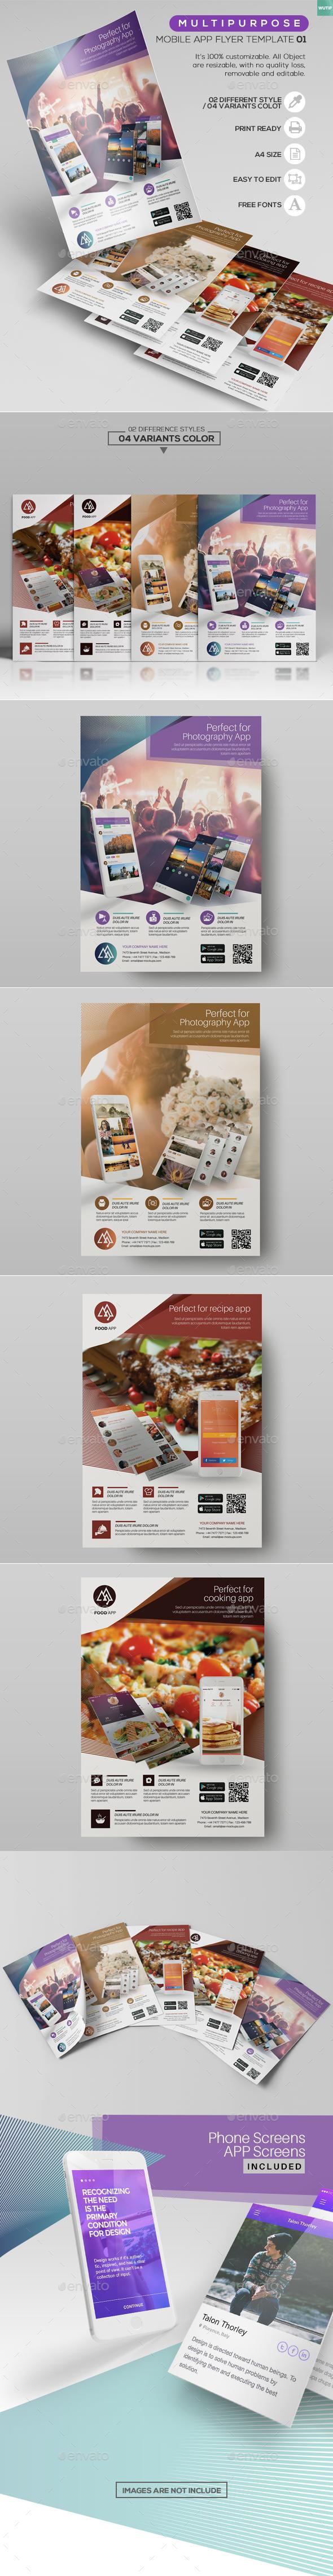 Multipurpose/ Mobile App Flyer Template01 - Commerce Flyers